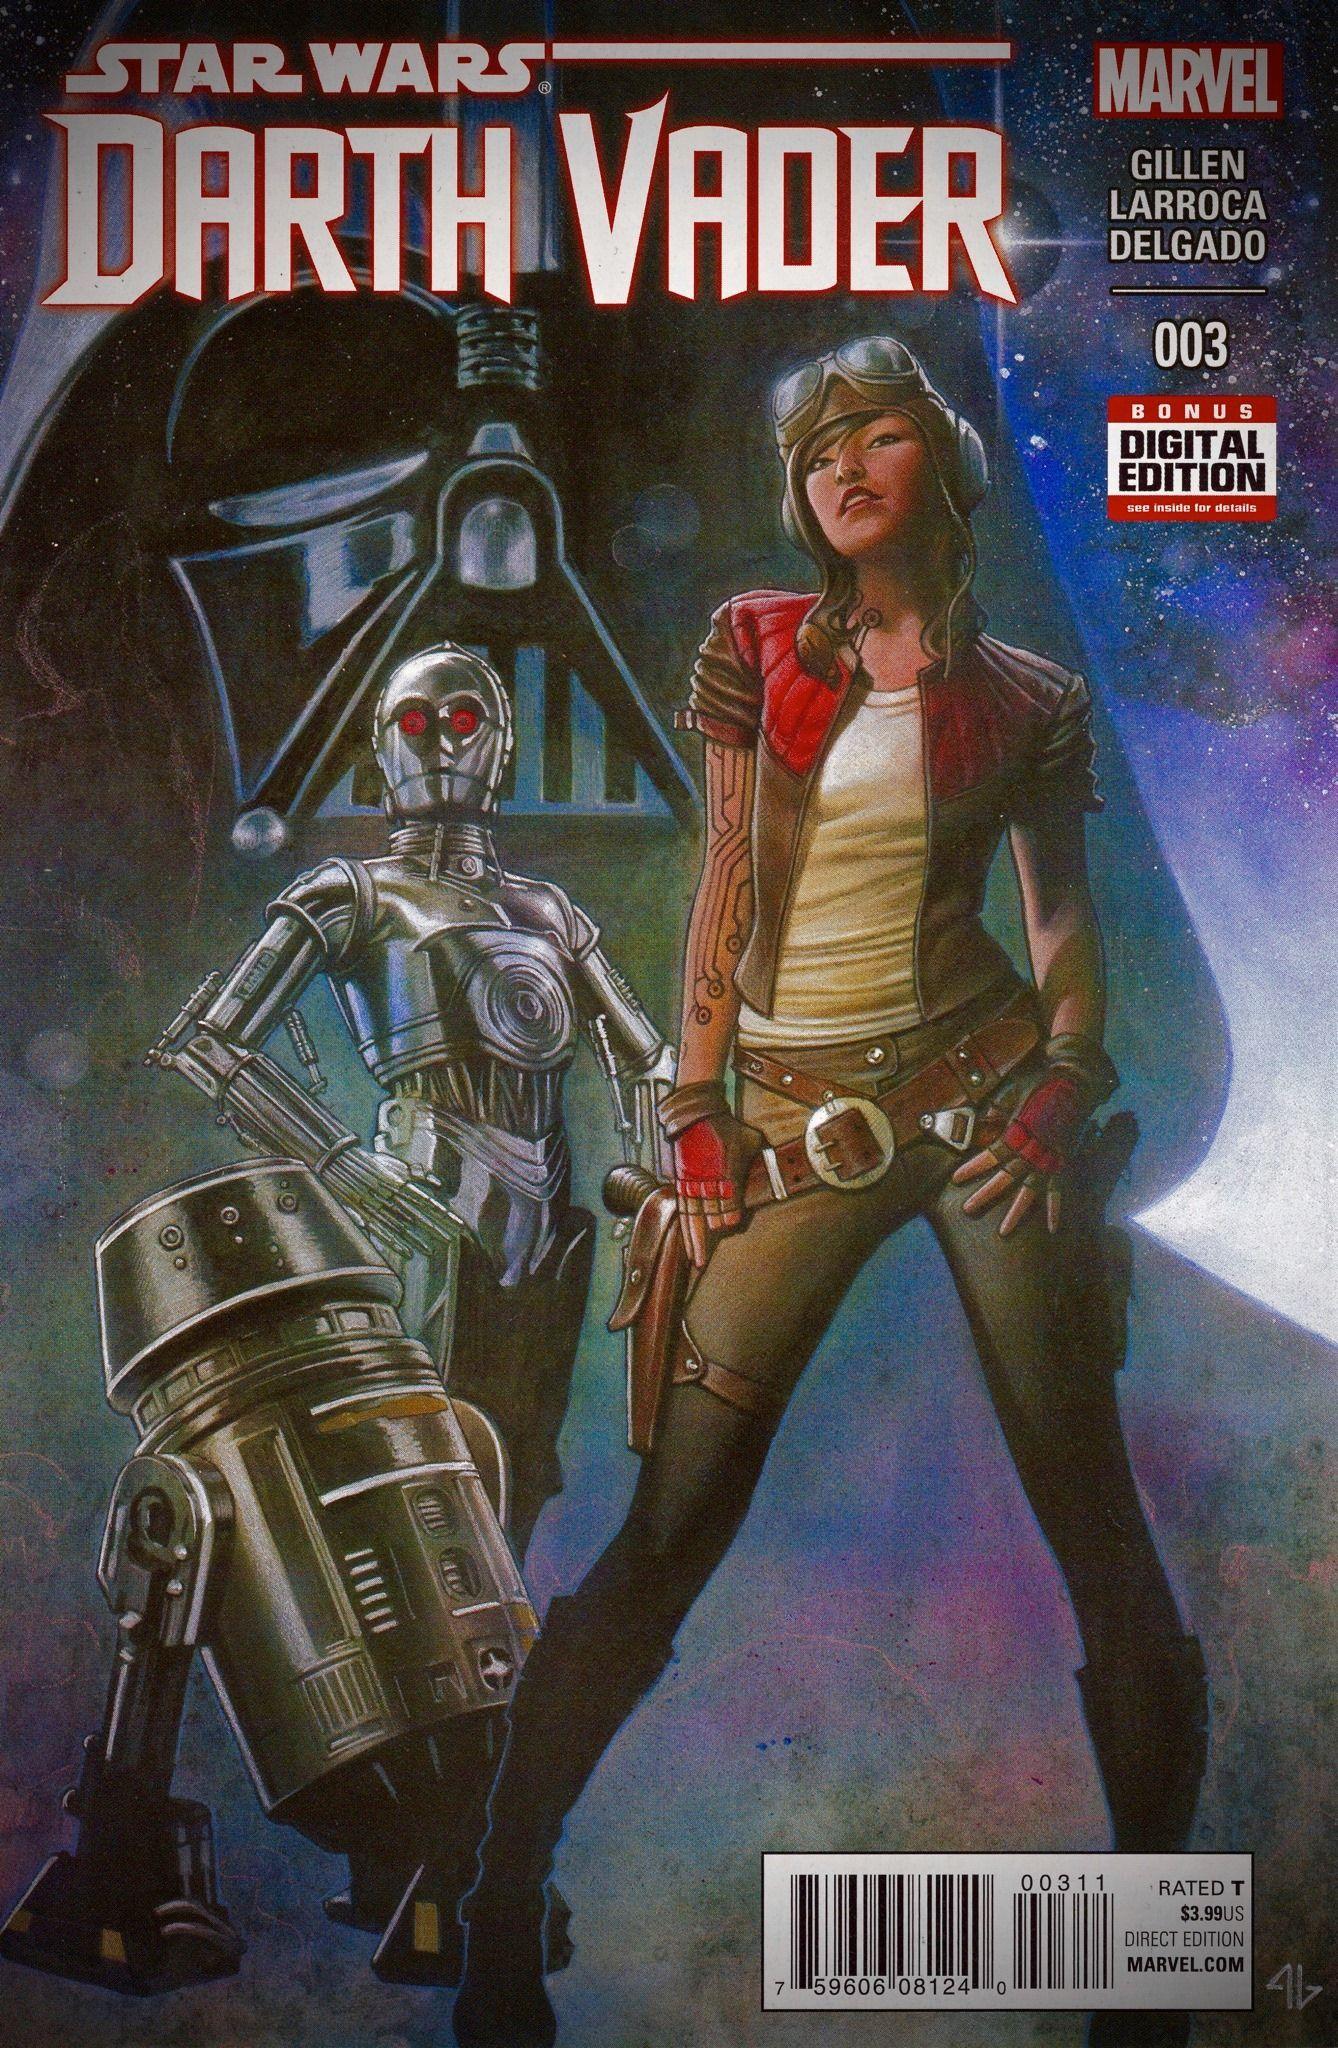 Marvel Comic Star Wars Dv 3 Vader Iii Turmoil Has Engulfed The Galactic Empire Star Wars Comics Star Wars Darth Star Wars Characters